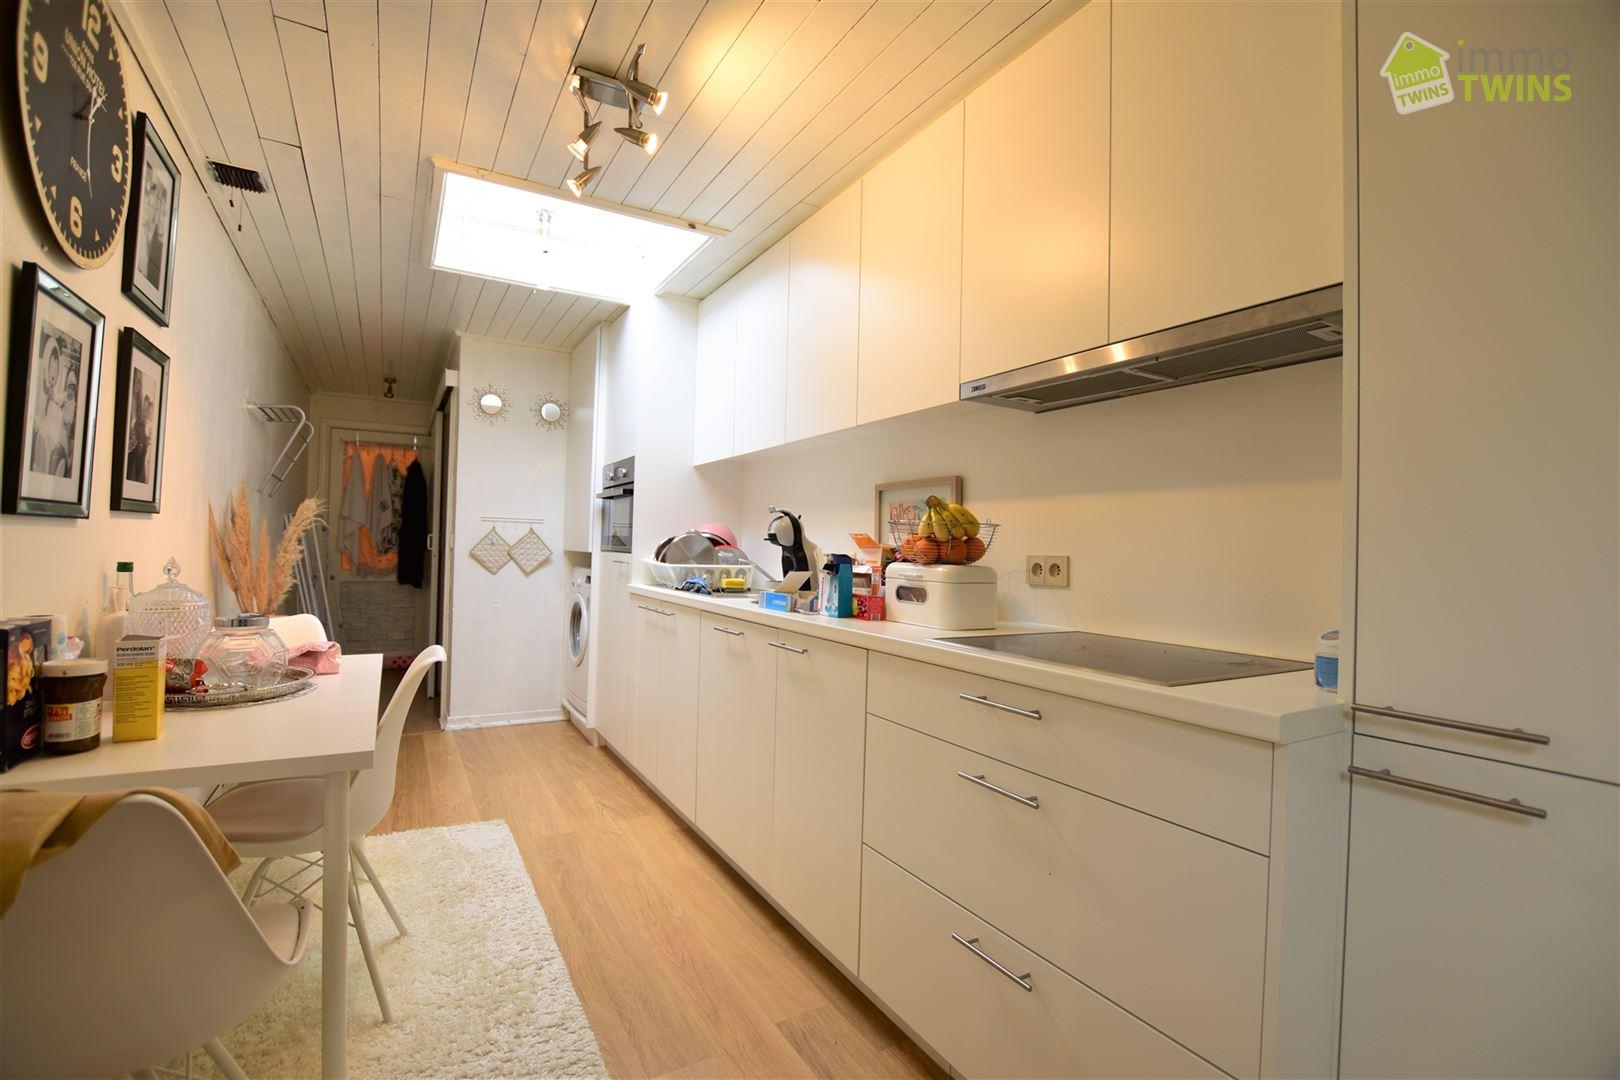 Foto 9 : Woning te 9200 Sint-Gillis-bij-Dendermonde (België) - Prijs € 585